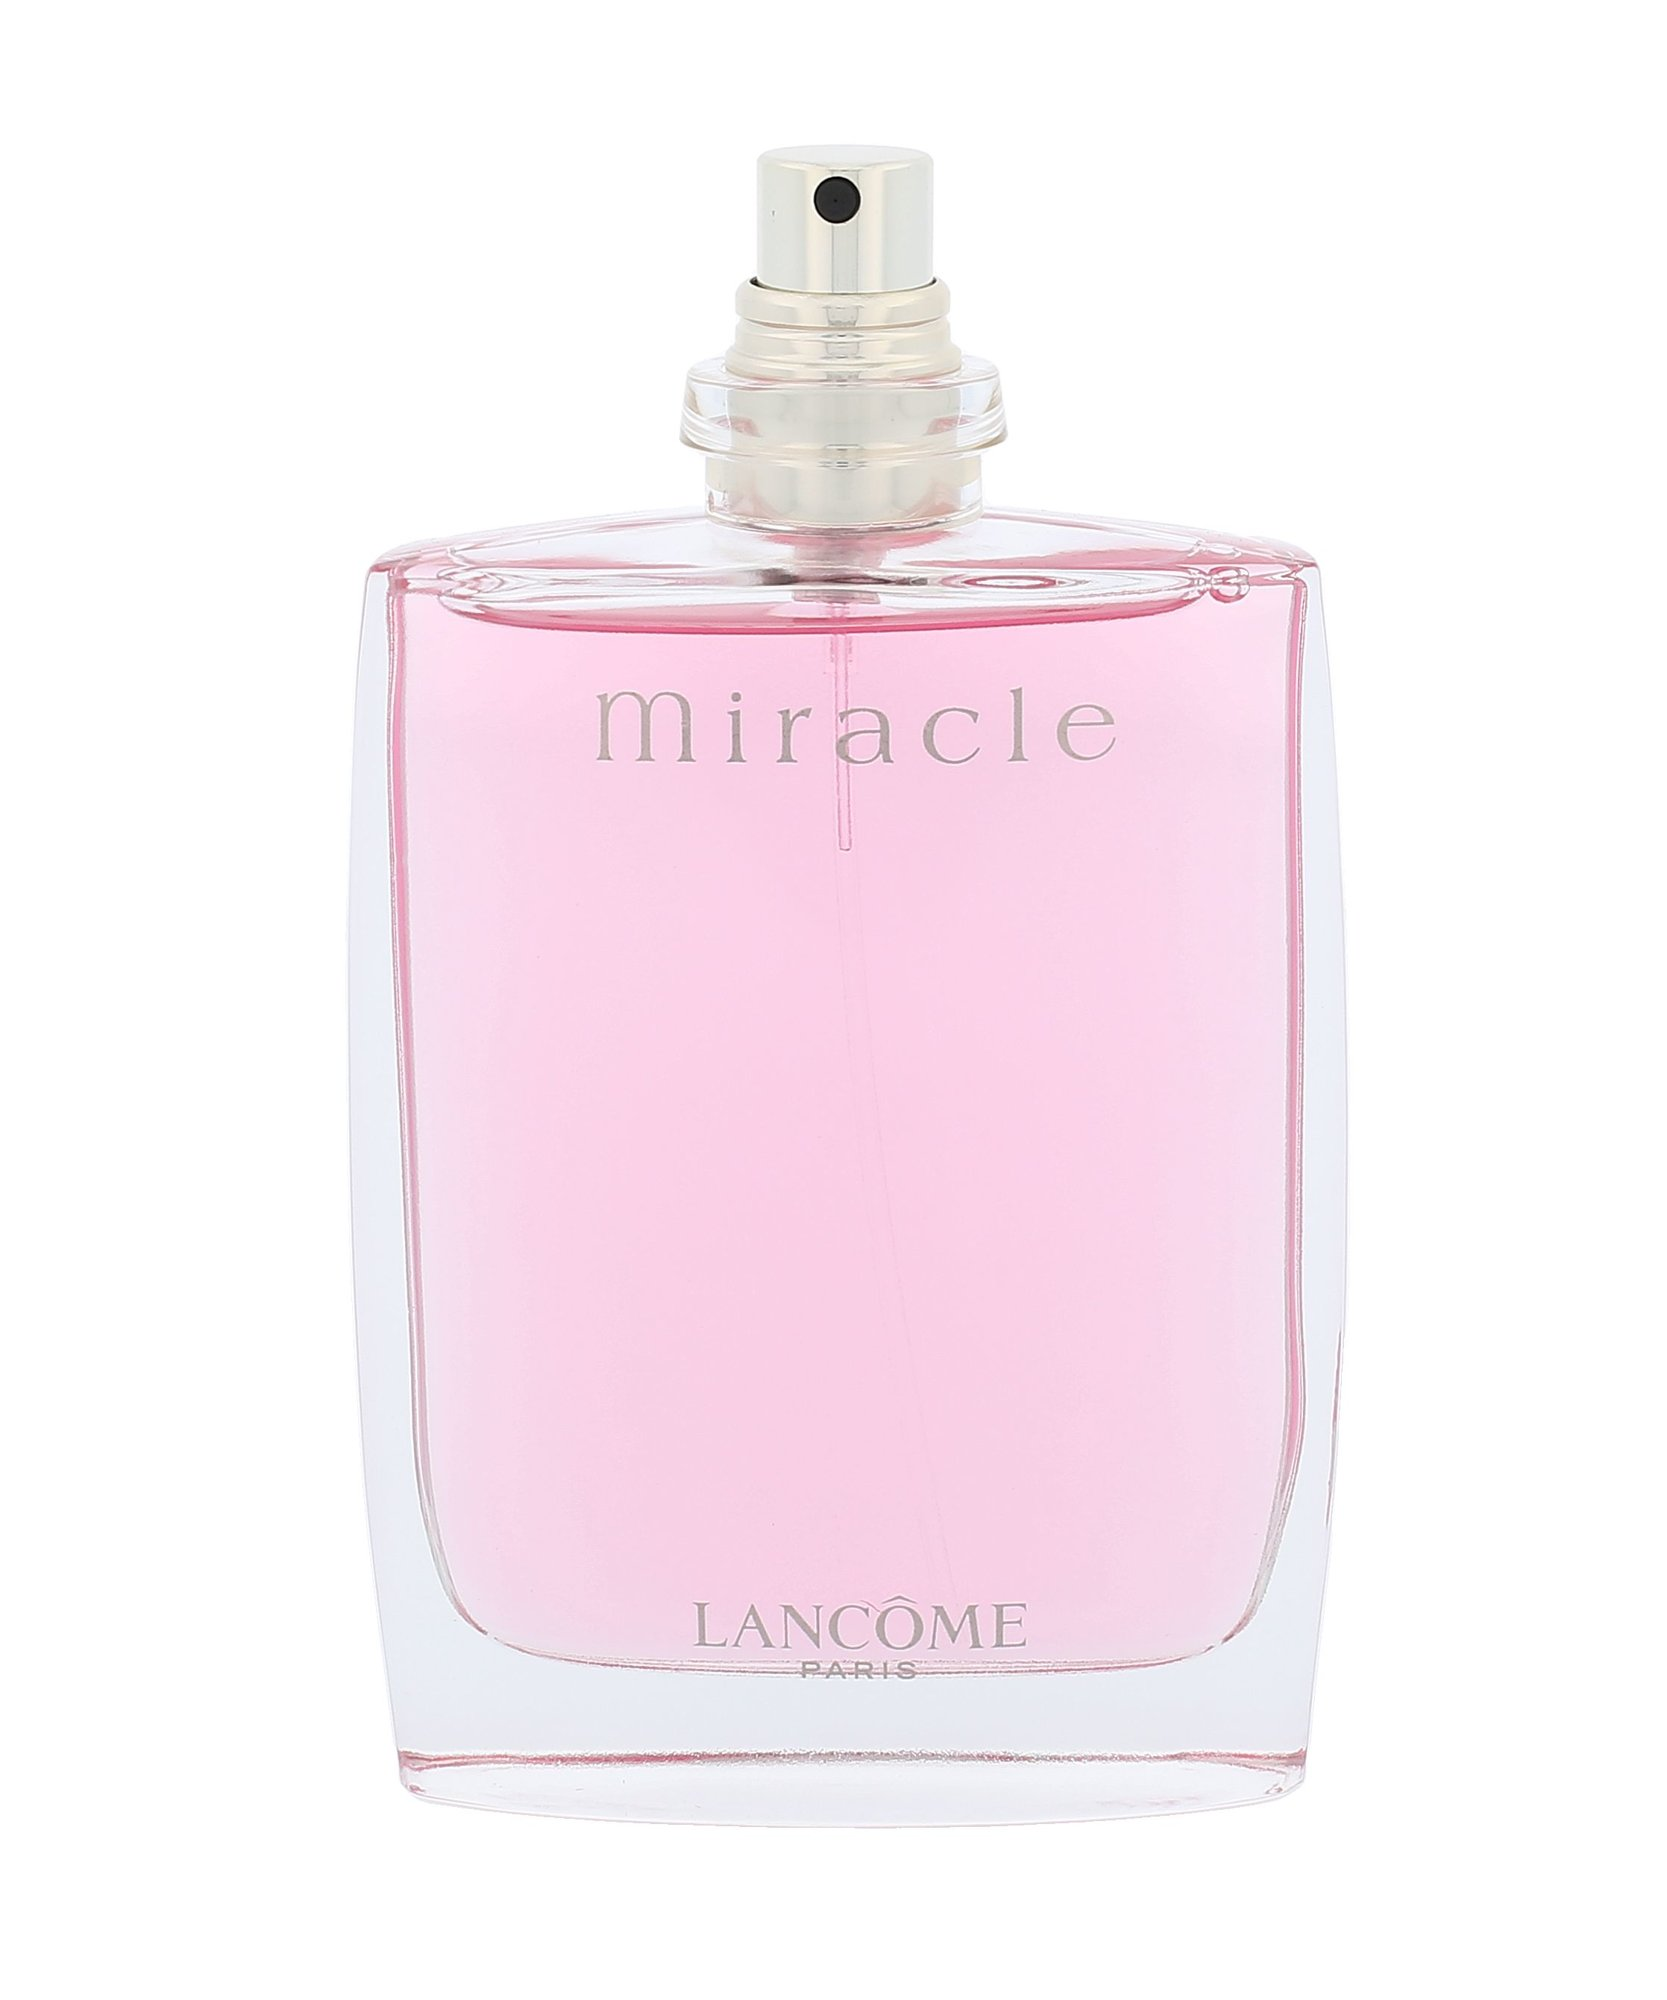 Lancôme Miracle EDP 100ml